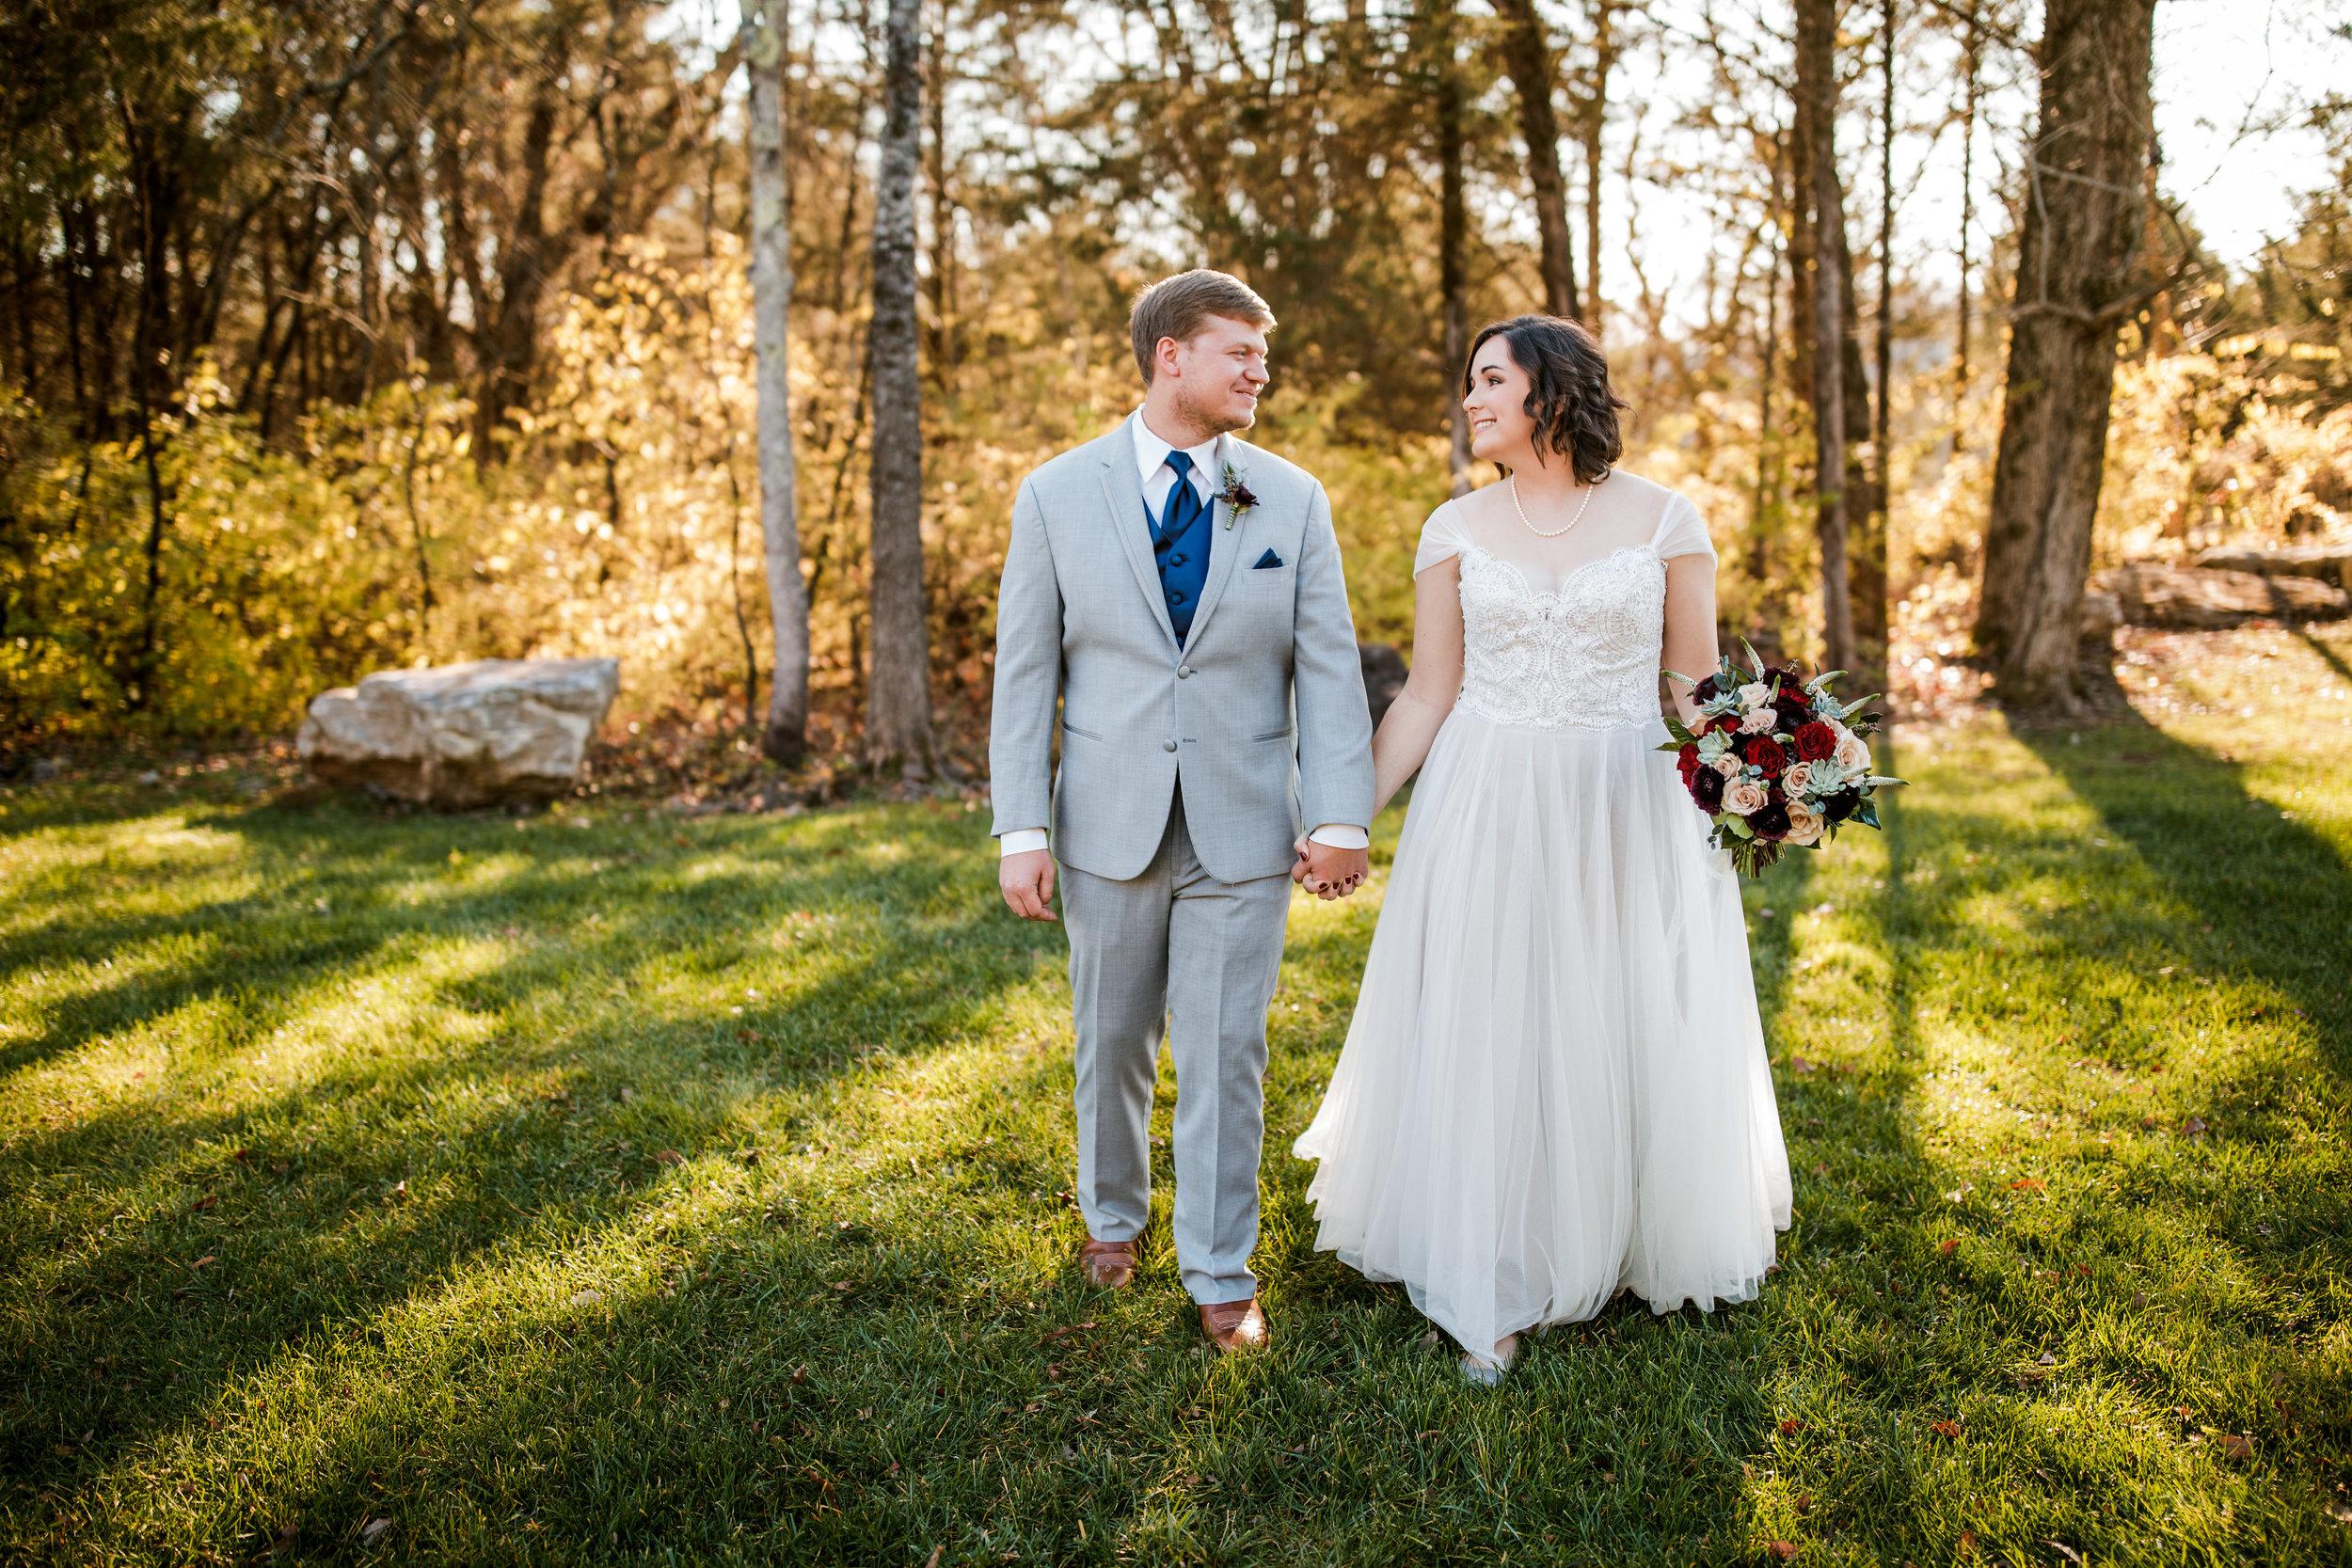 Graystone-Quarry-Wedding 26.jpg